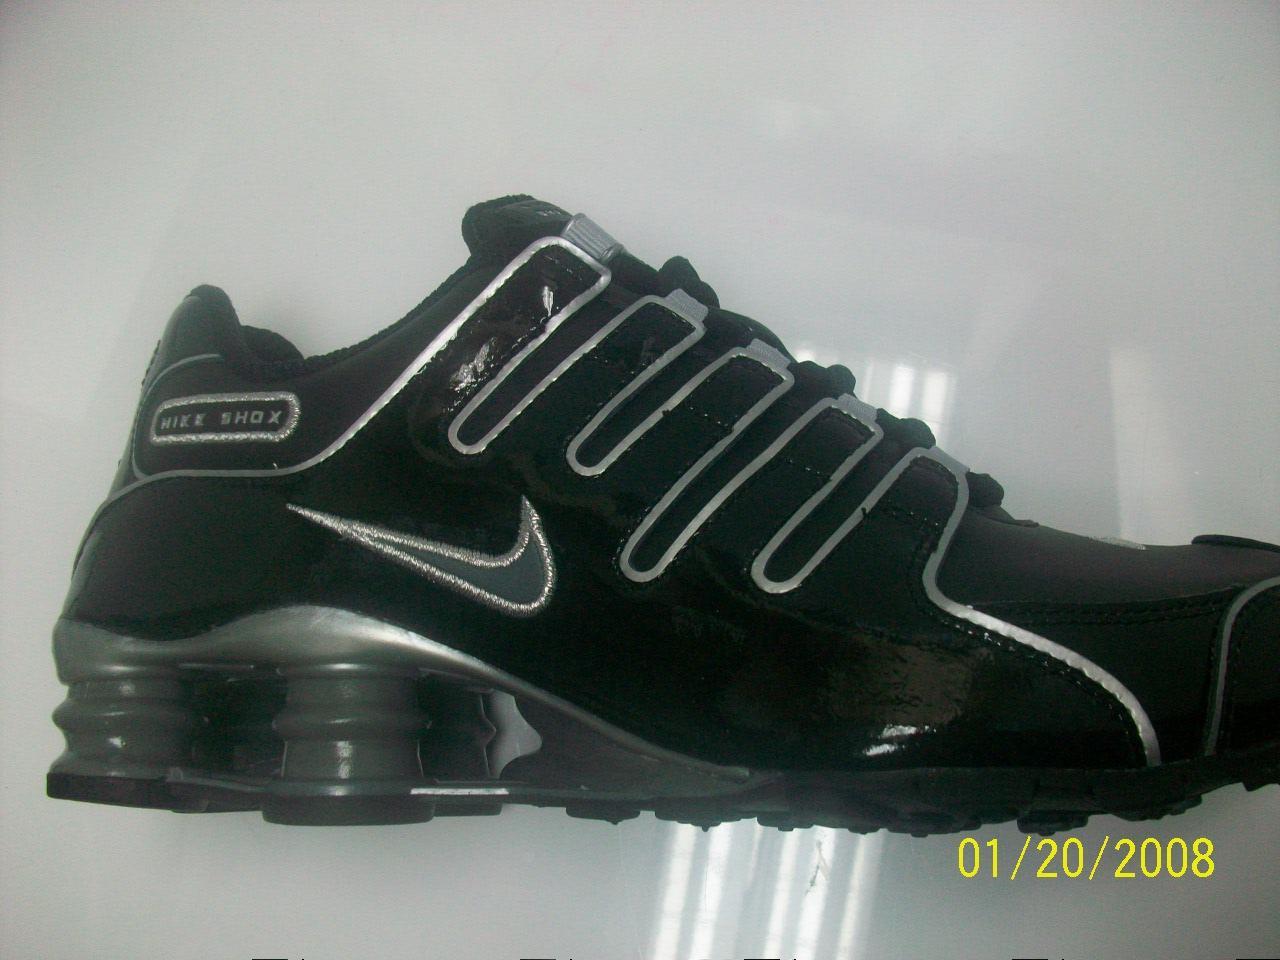 huge selection of 4724c 1469b Nike Shox Turbo Oh Kids